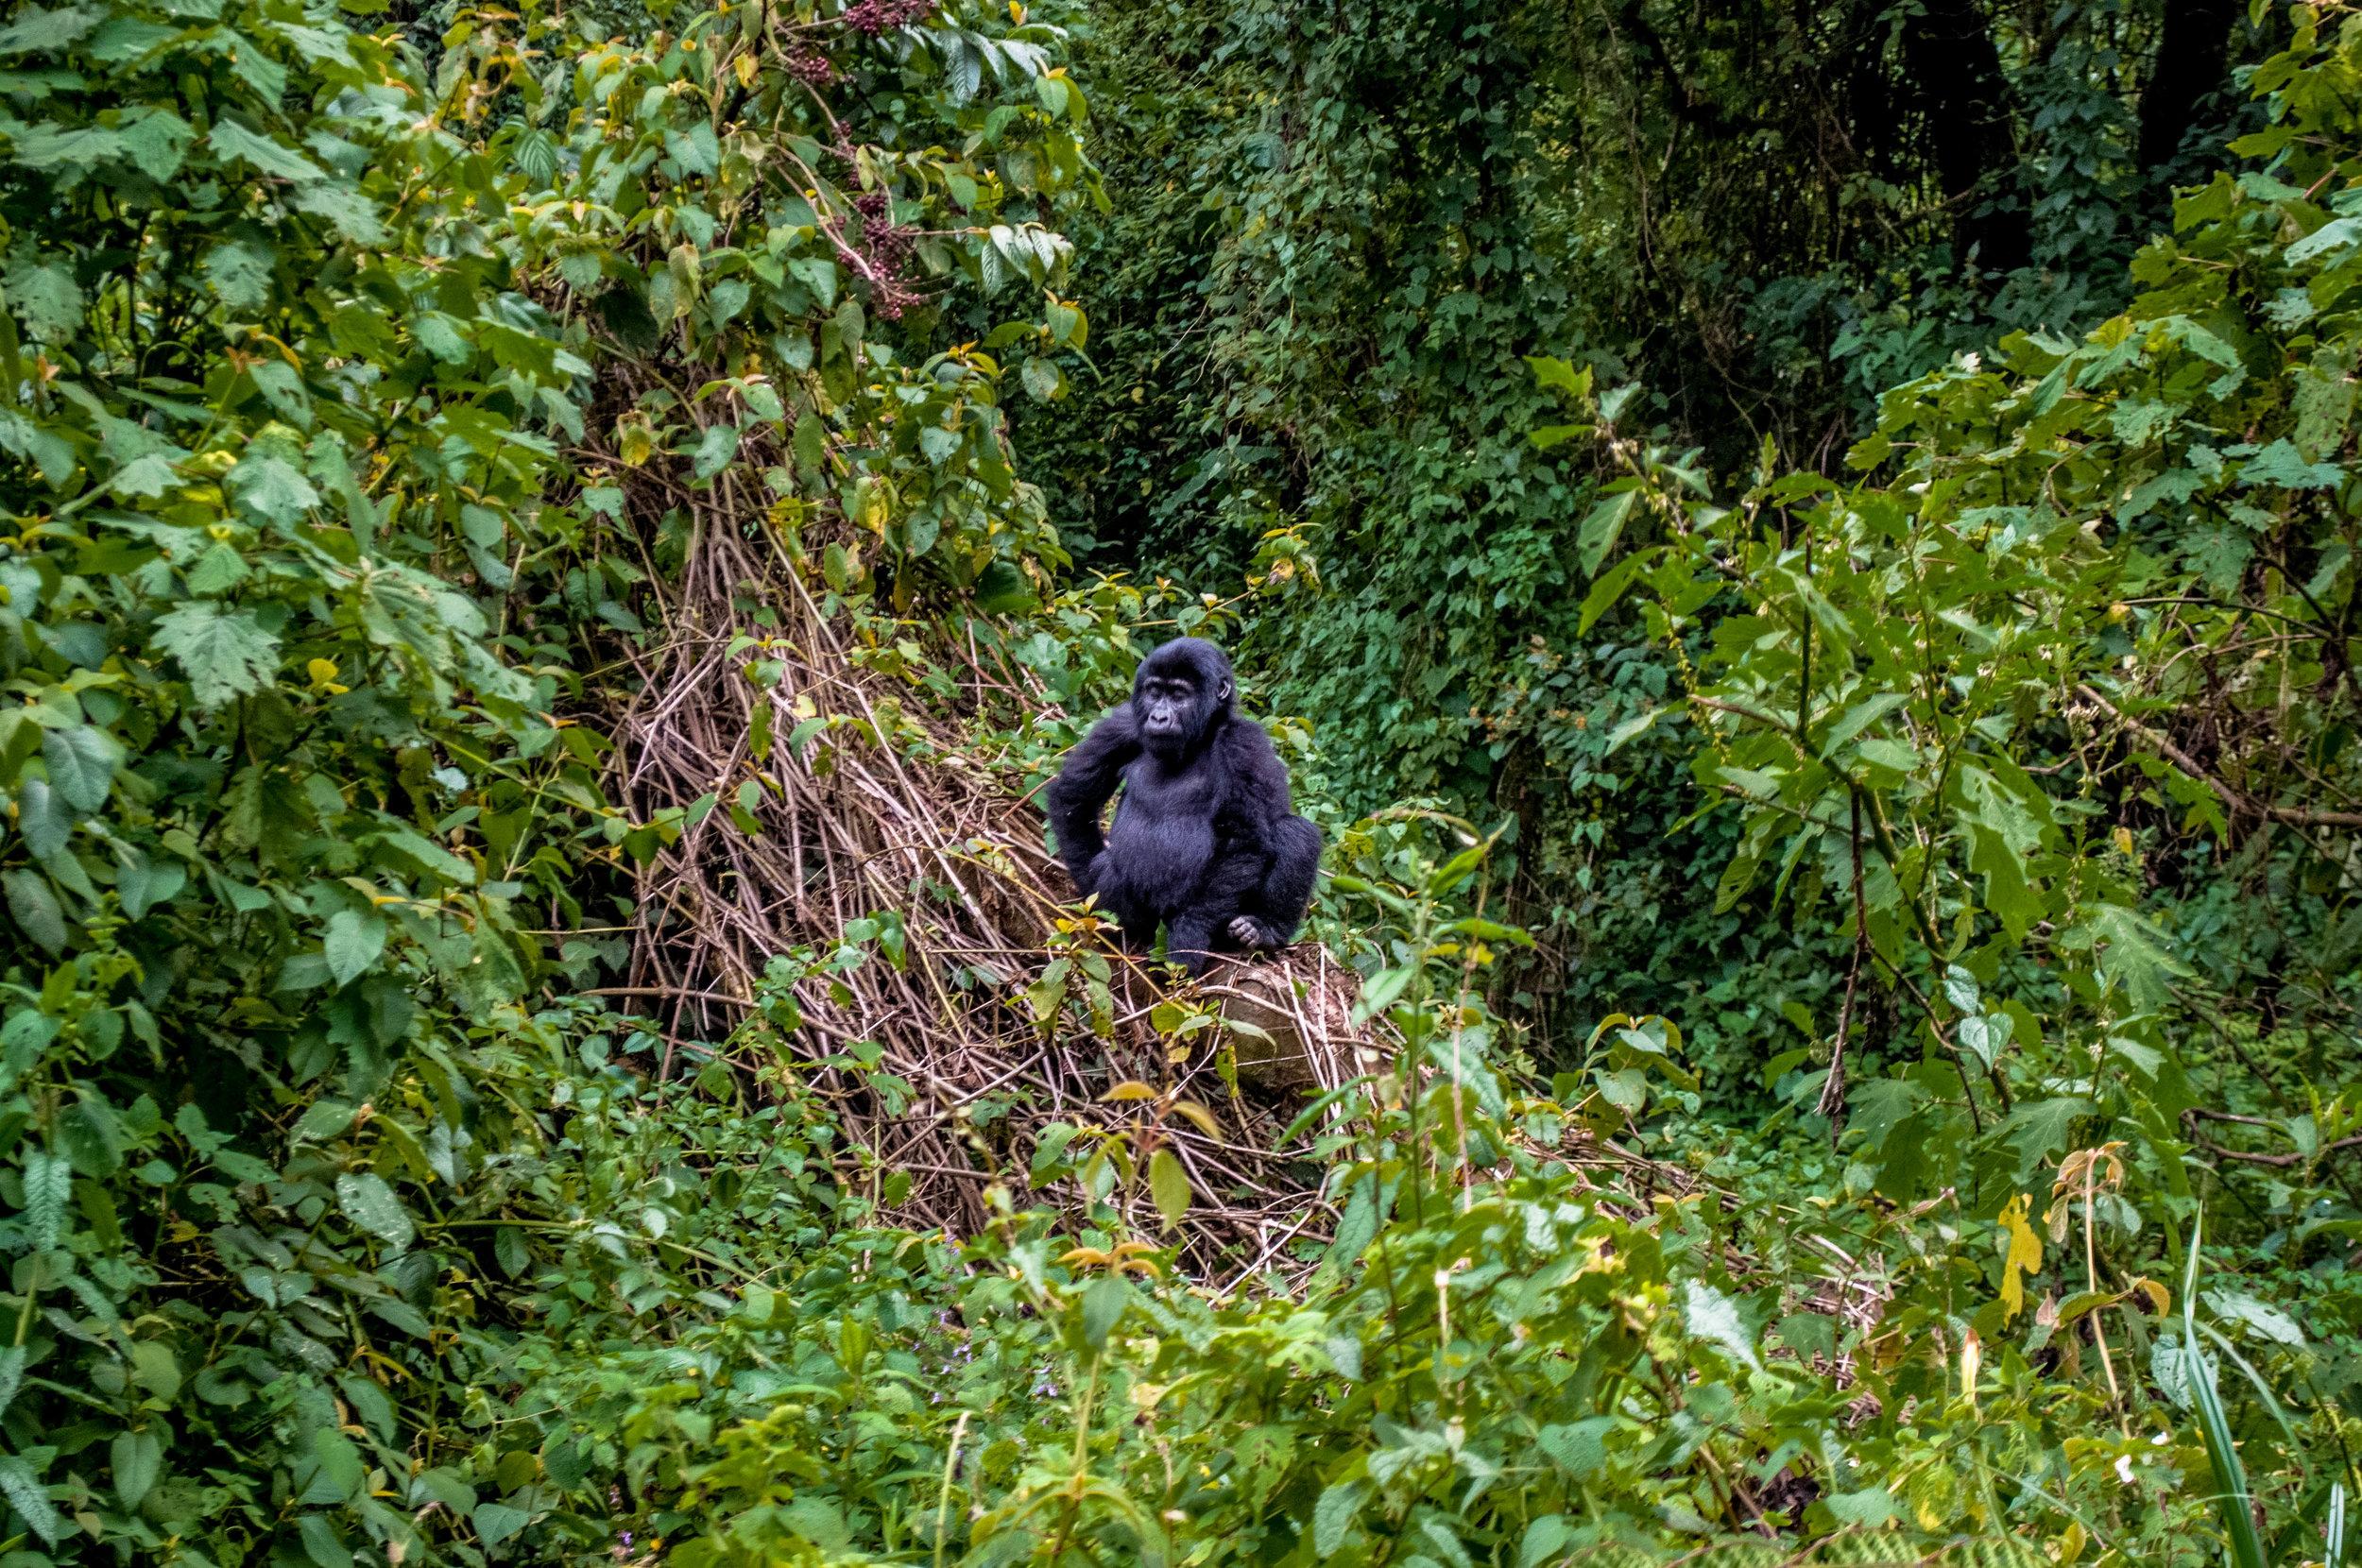 Gorilla-7.jpg